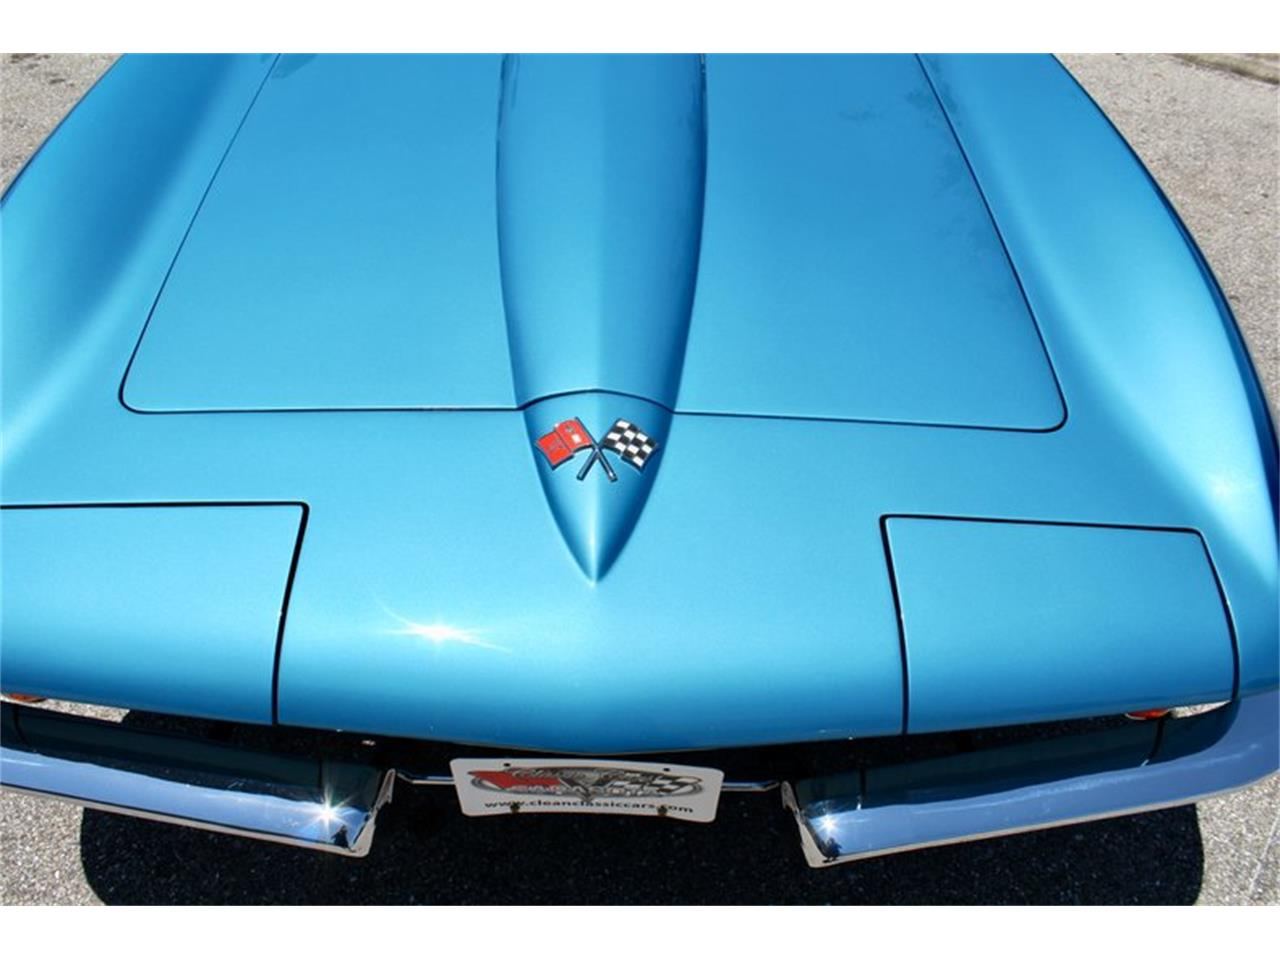 Large Picture of Classic '65 Corvette located in Sarasota Florida - $69,500.00 - QSRR